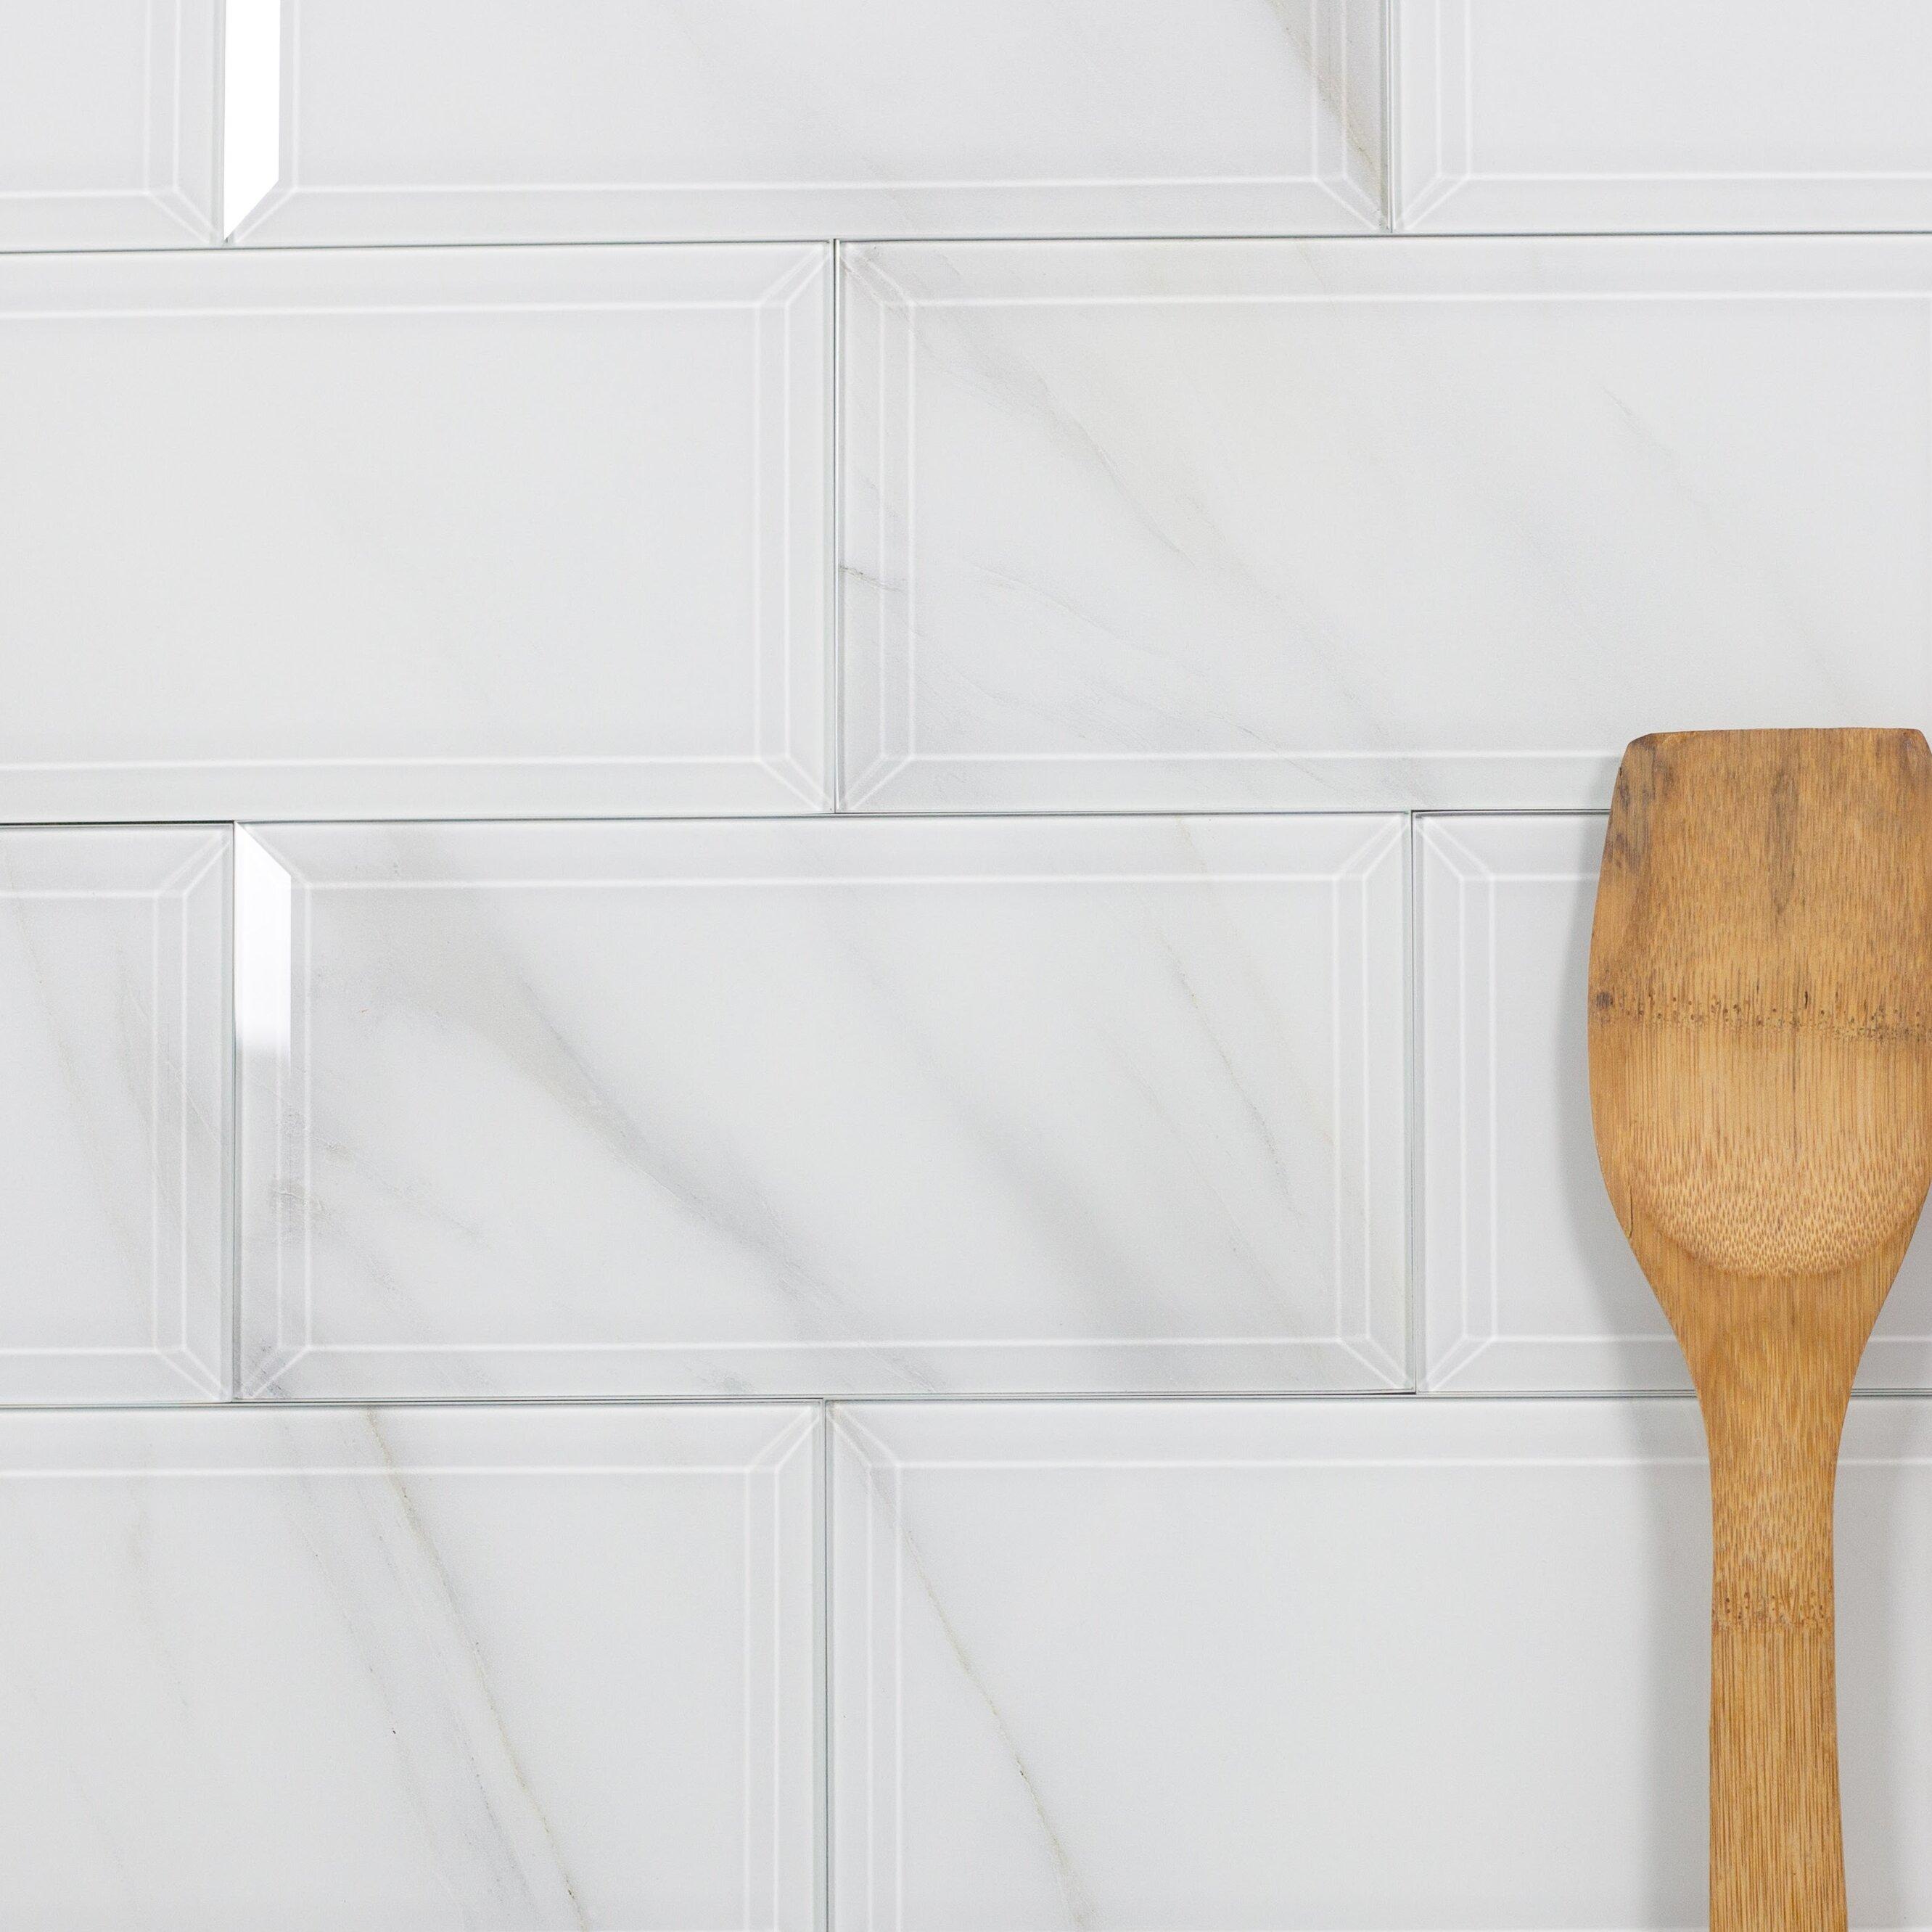 Abolos Nature Wall Backsplash Beveled Edge 4 X 8 Gl Subway Tile In White Gray Veins Wayfair